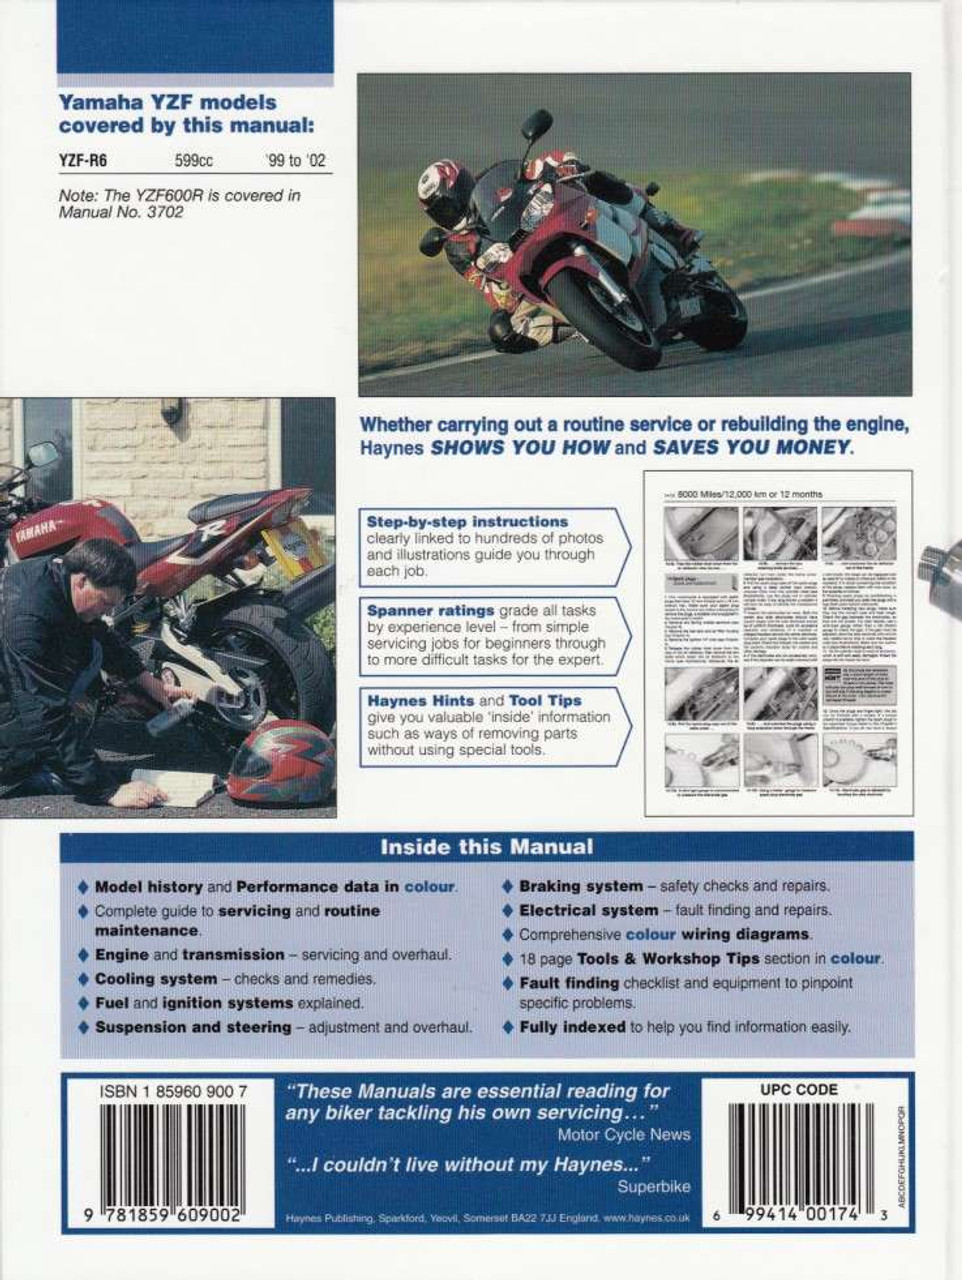 Yamaha Yzf R6 Yzf R6 600cc 1999 2002 Haynes Workshop Manual Service Repair Archives Midweek Com